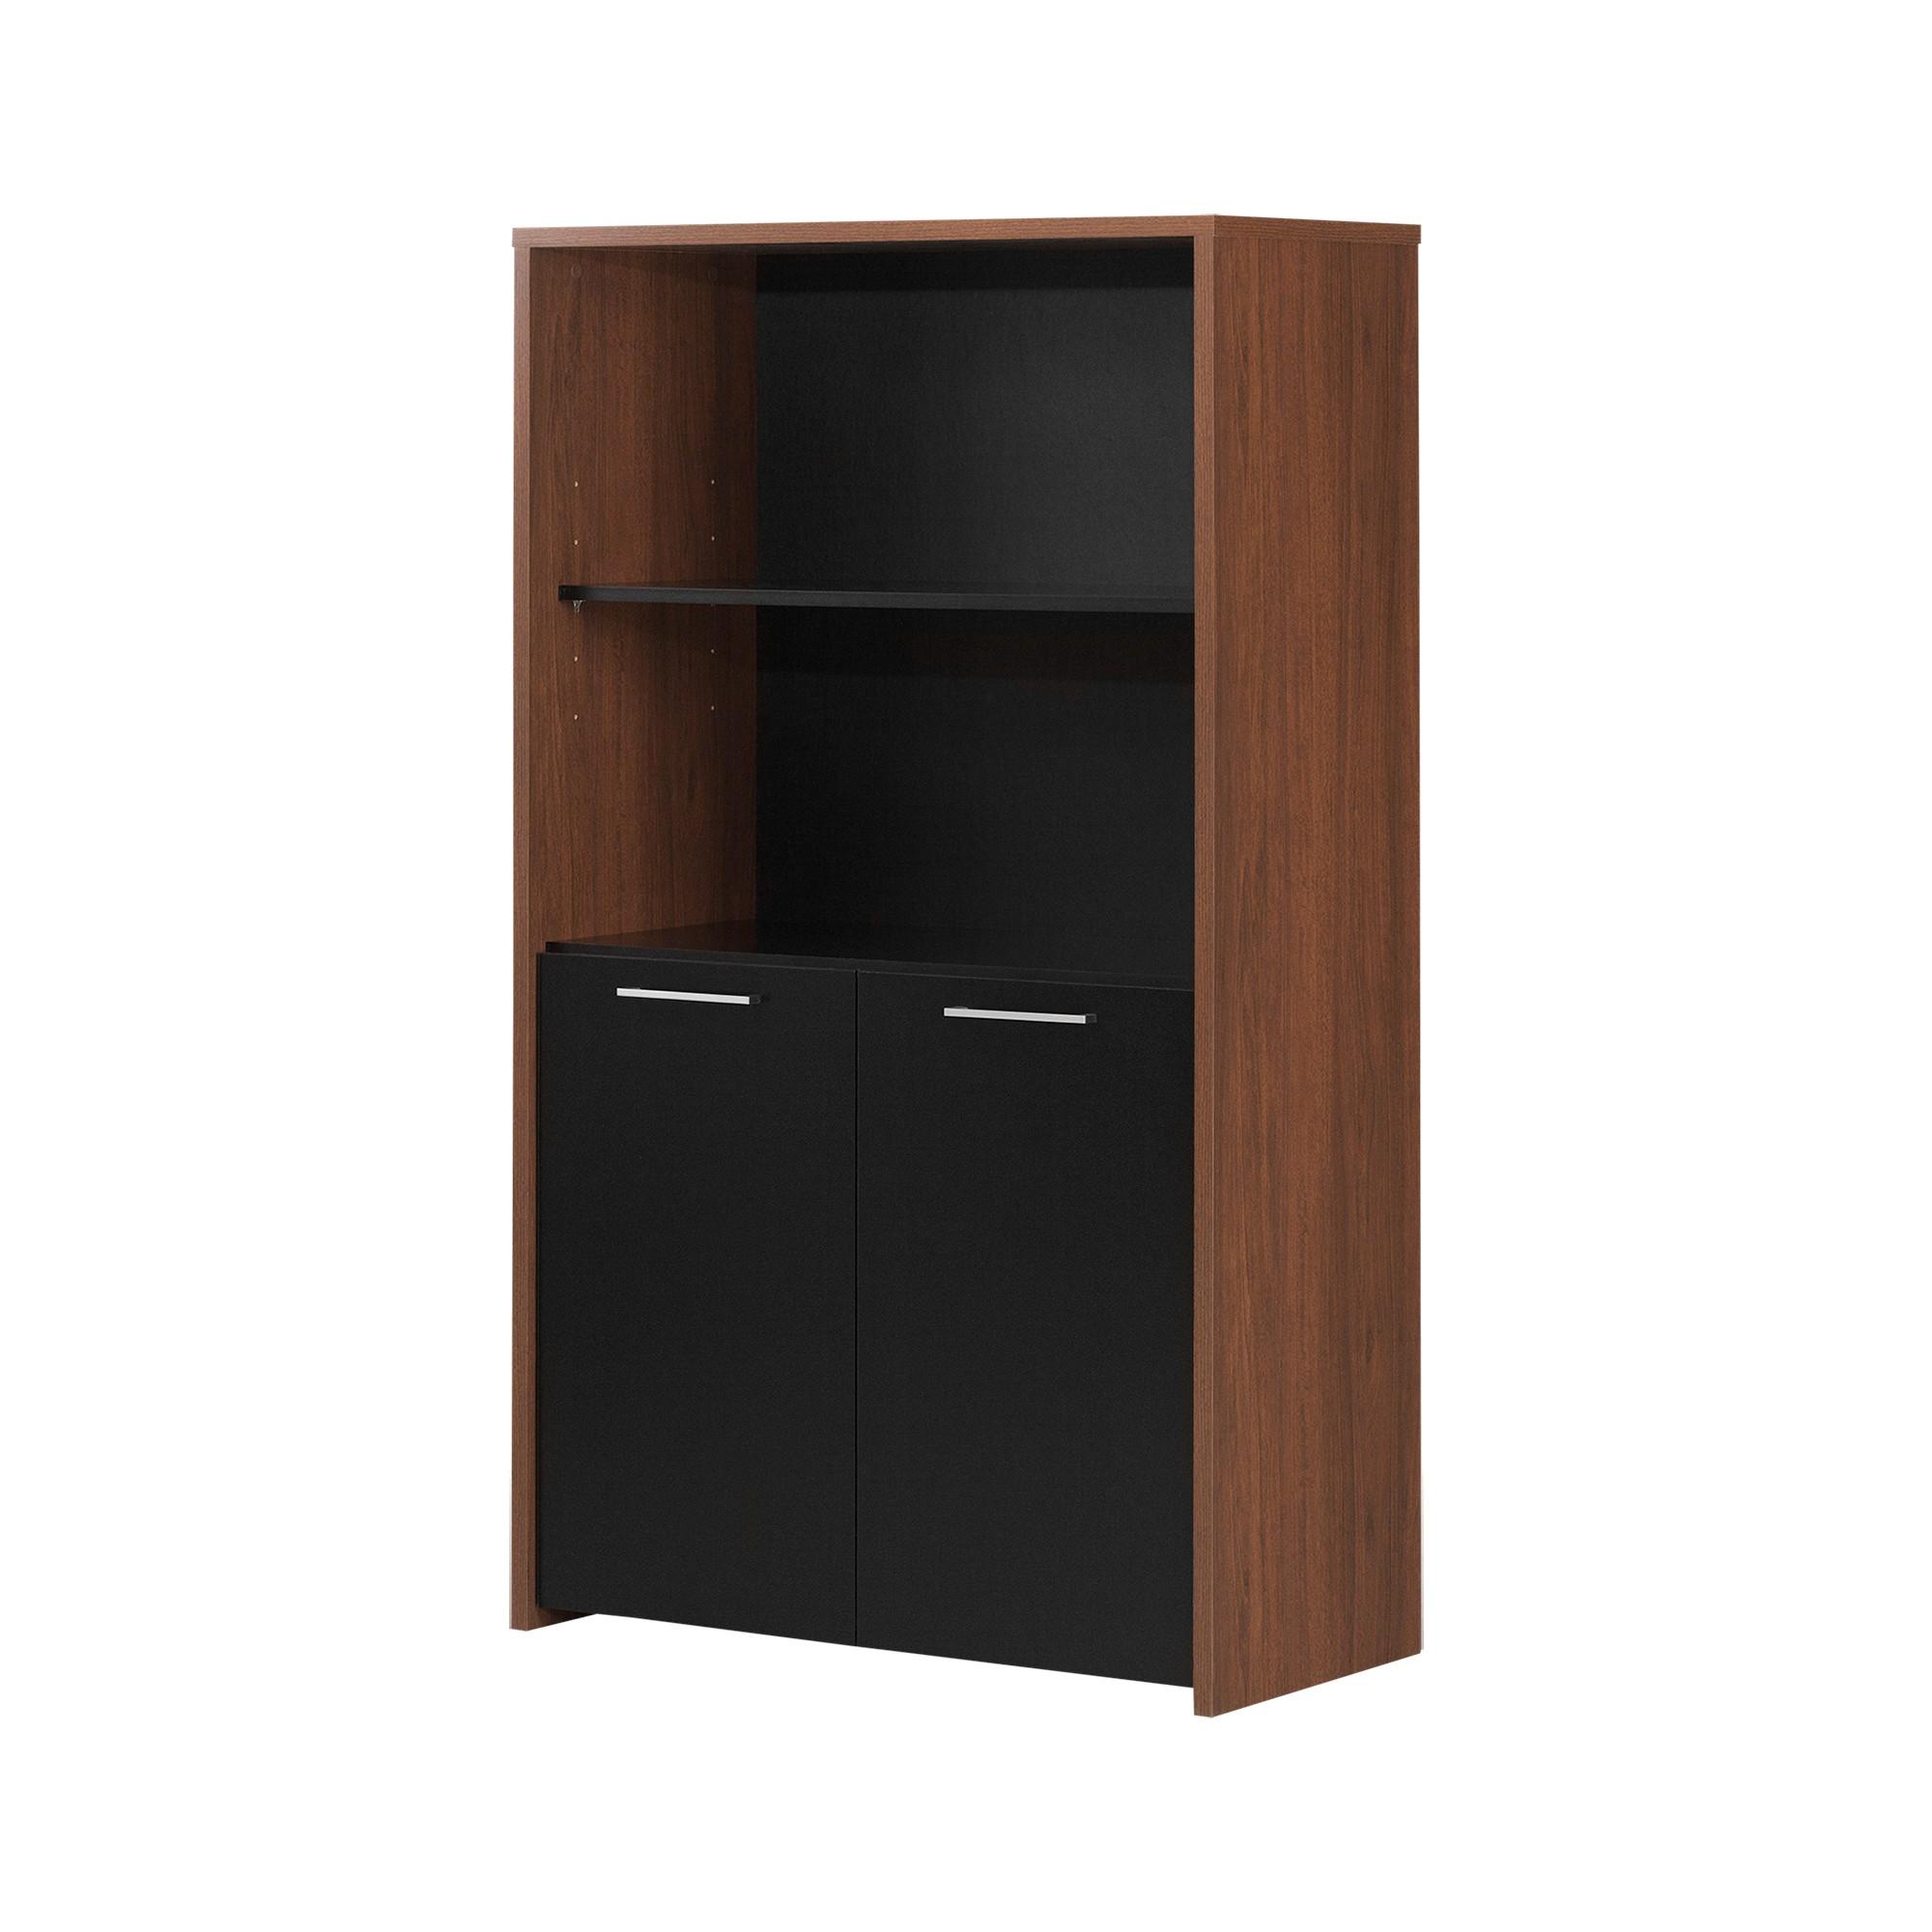 60 Tasko Storage Bookcase With Doors Walnut South Shore Bookcase Storage Storage Bookcase